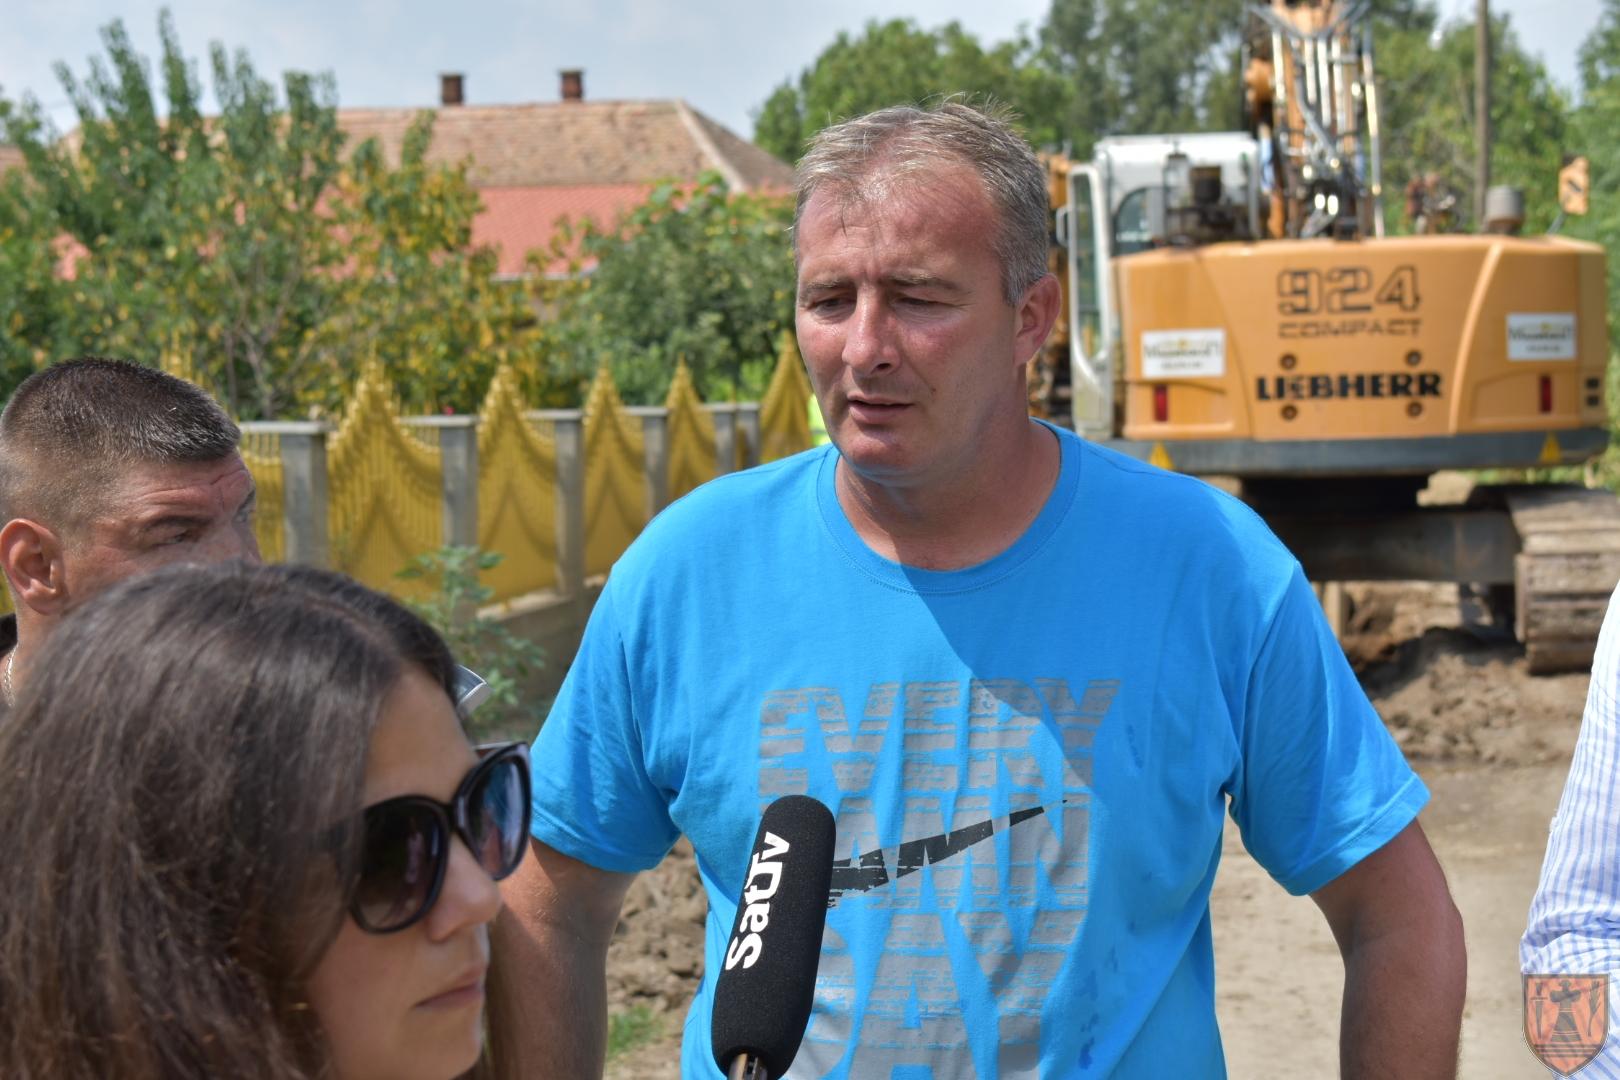 Gradonačelnik Grada Požarevca Bane Spasović obišao radove u Lučici 21694